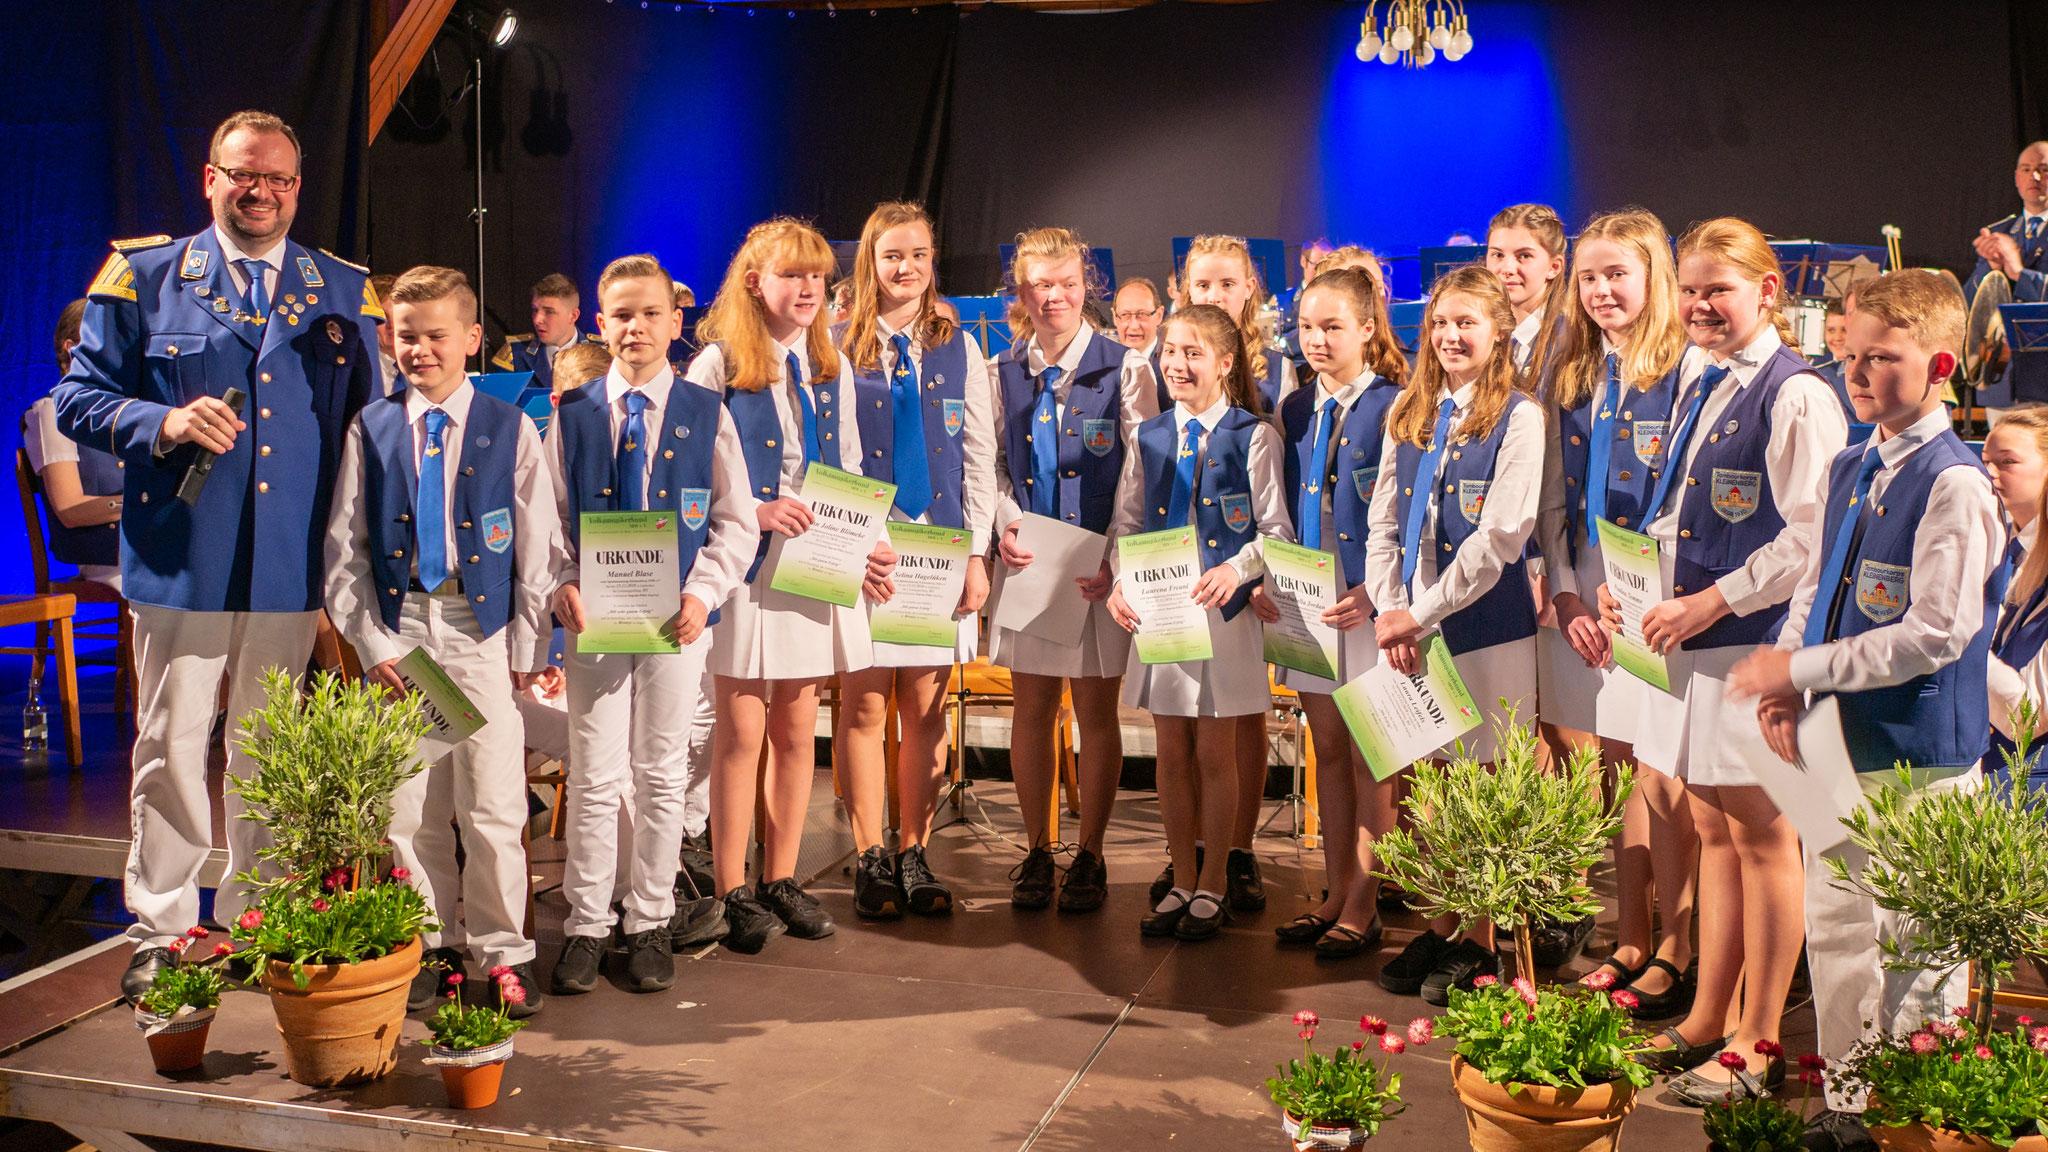 Auftritt beim Frühlingskonzert im April 2019